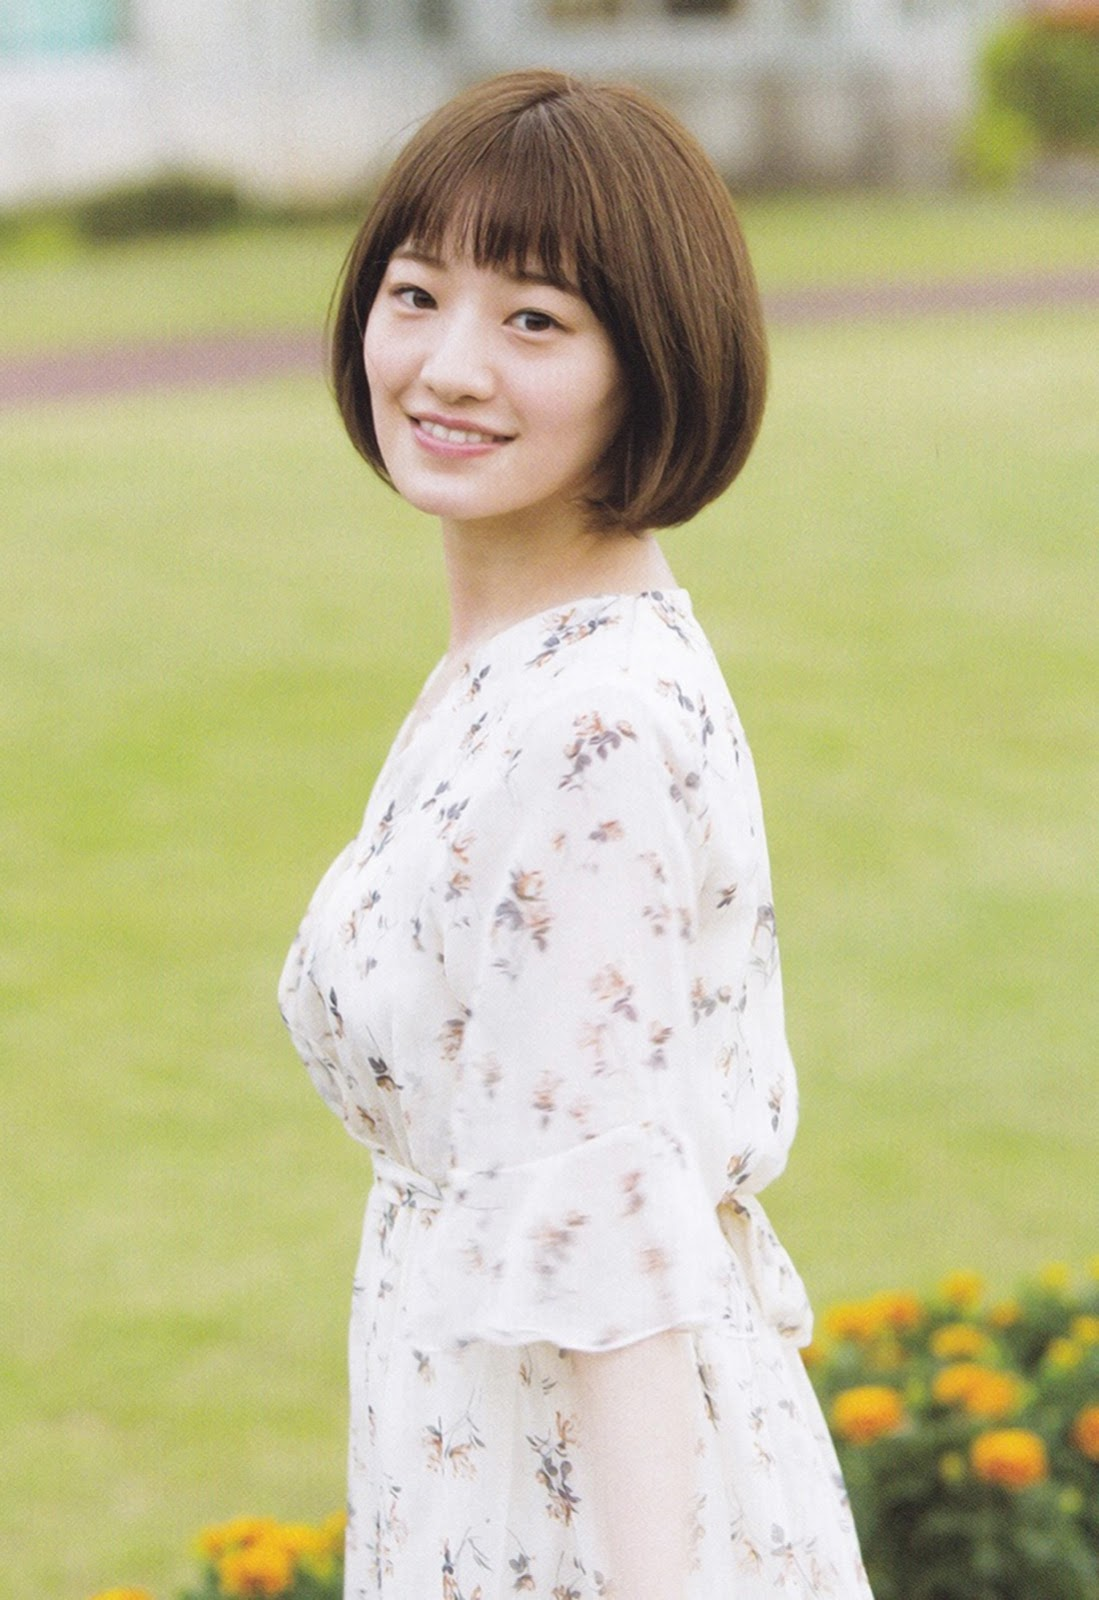 Nakada Kana 中田花奈, Saito Yuri 斉藤優里, B.L.T 2017年11月号